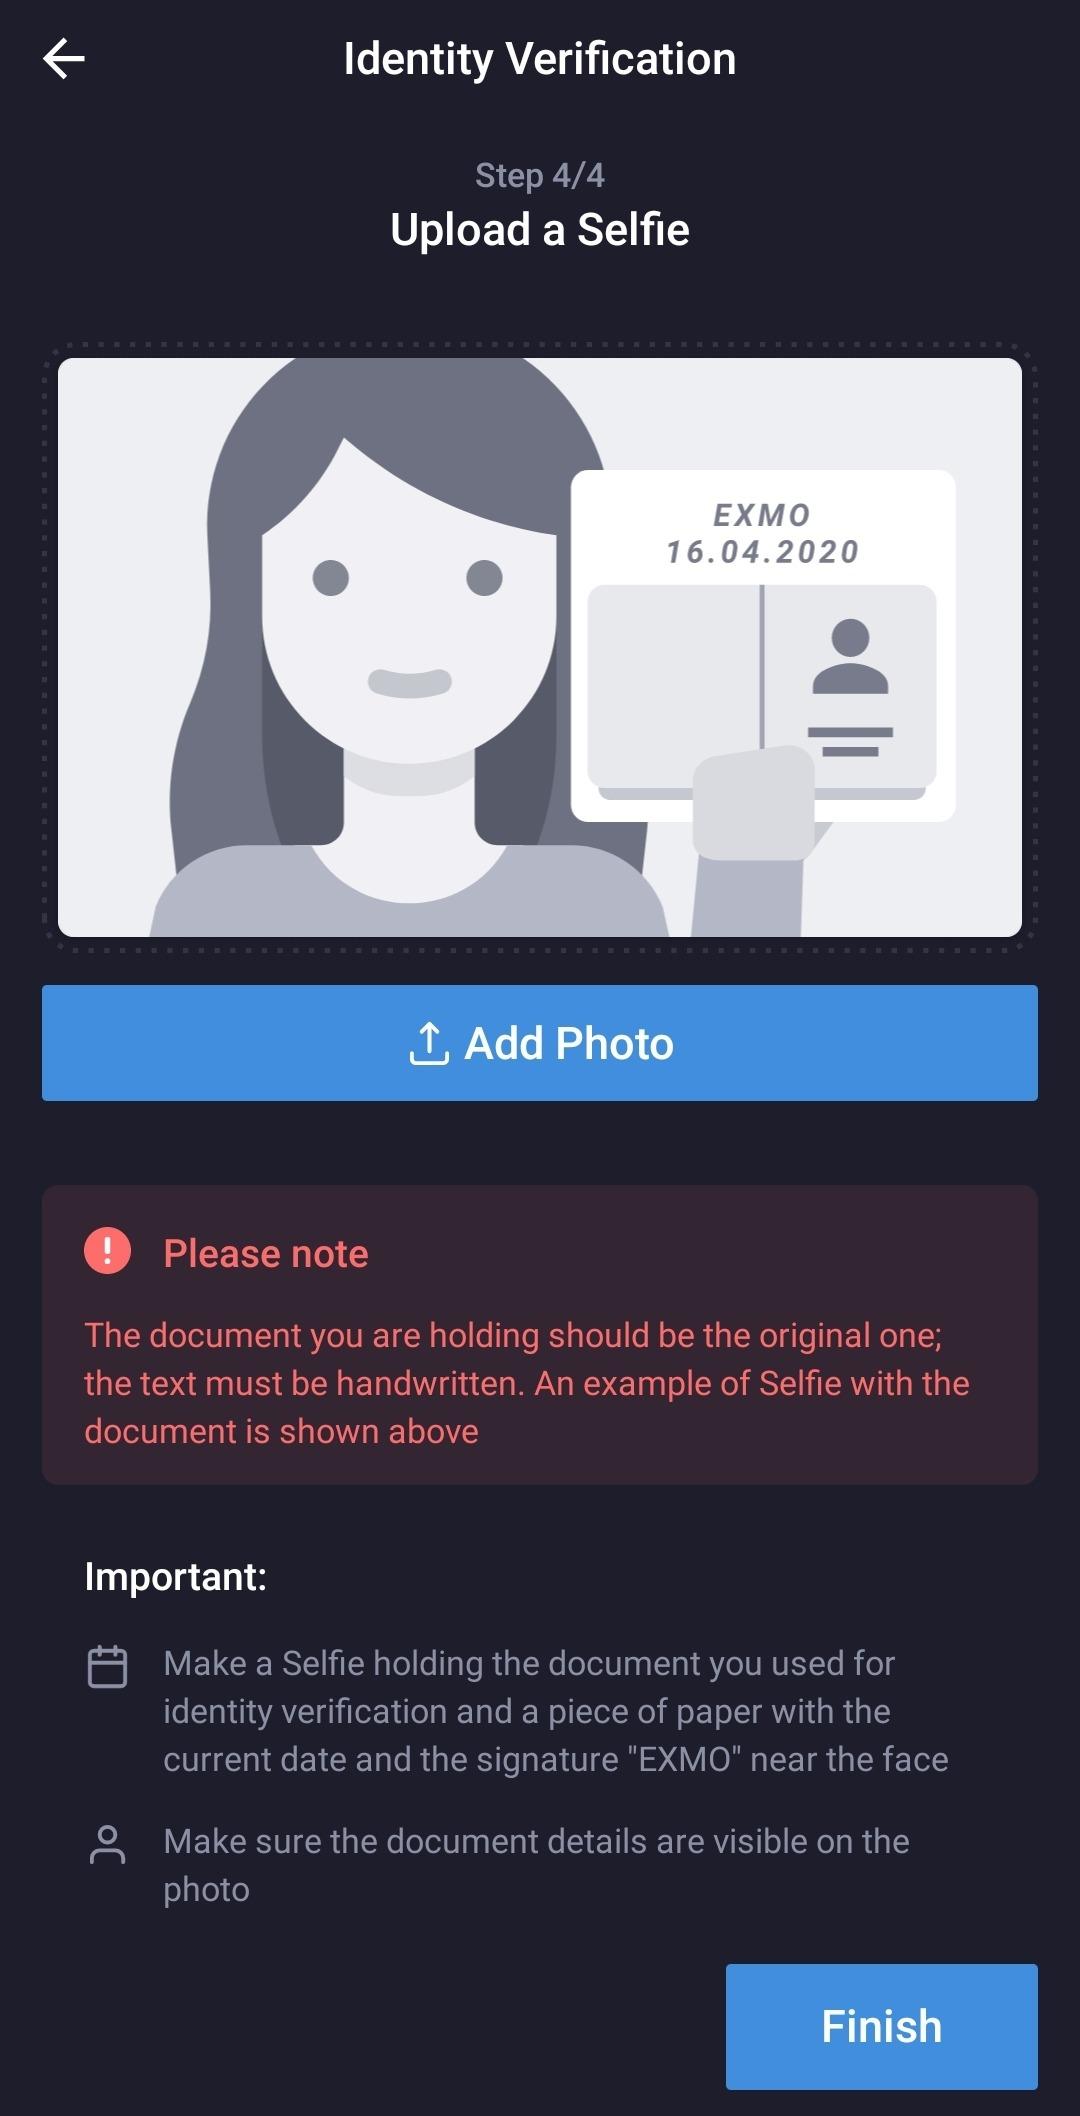 Identity verification 4